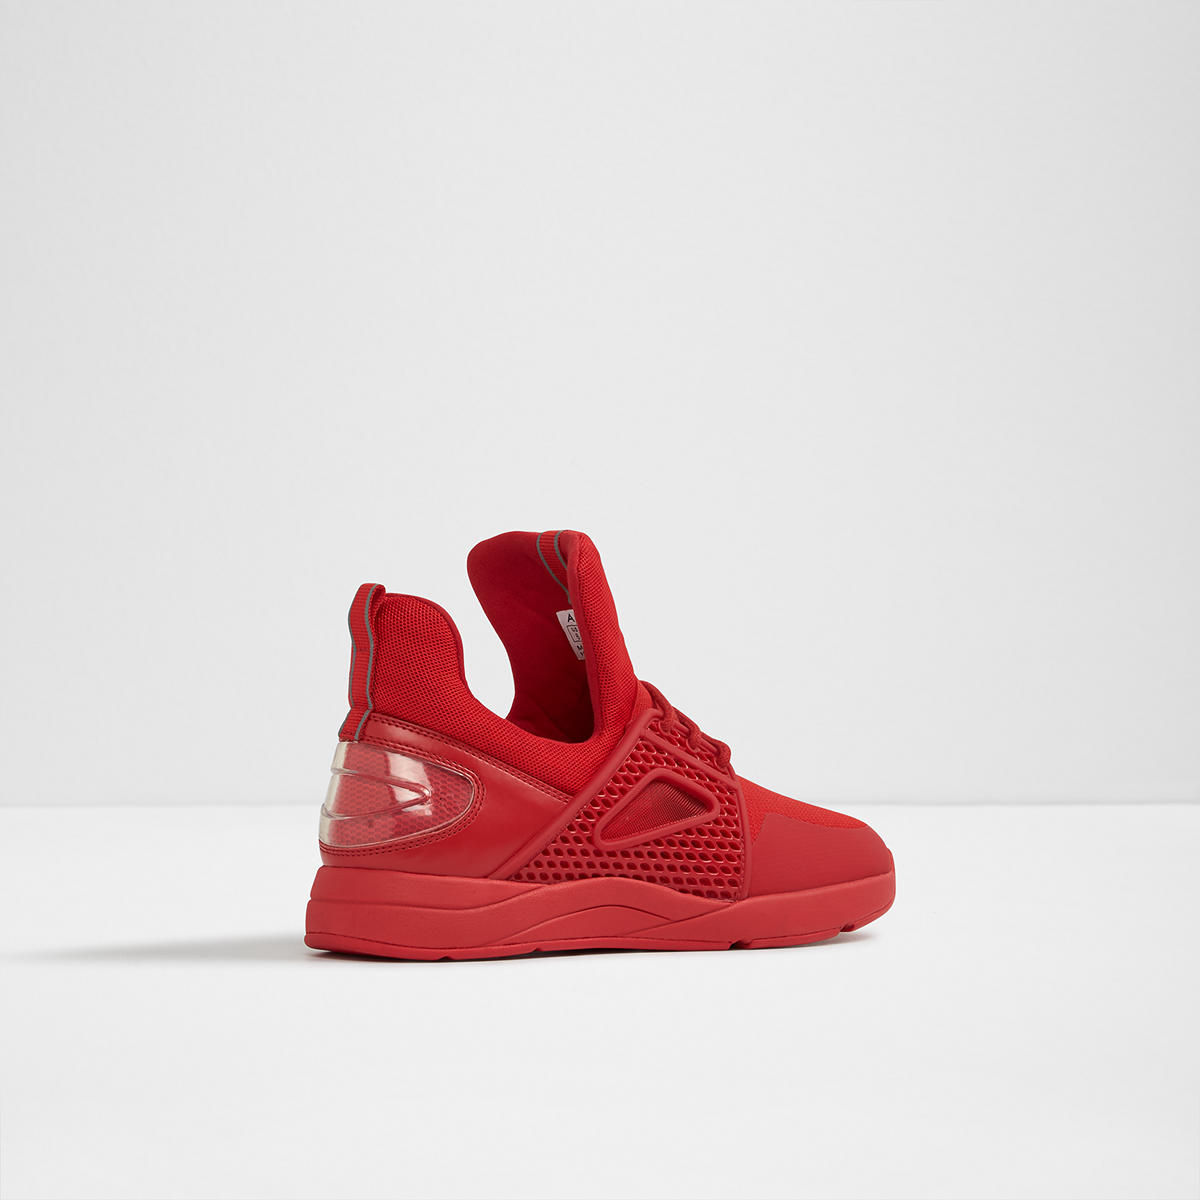 Aldo Shoes For Men On Red